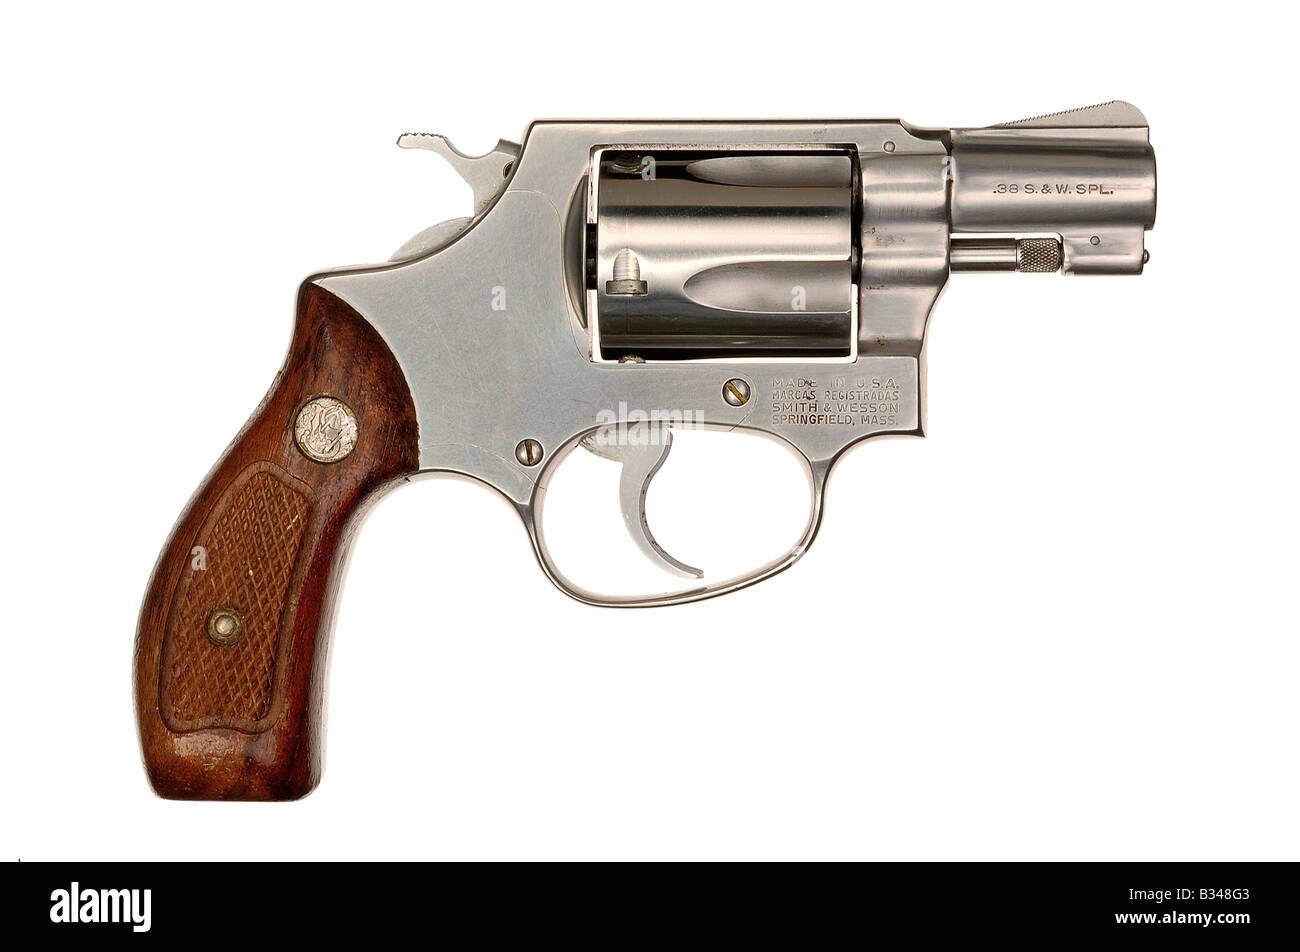 38 Revolver Stock Photos & 38 Revolver Stock Images - Alamy